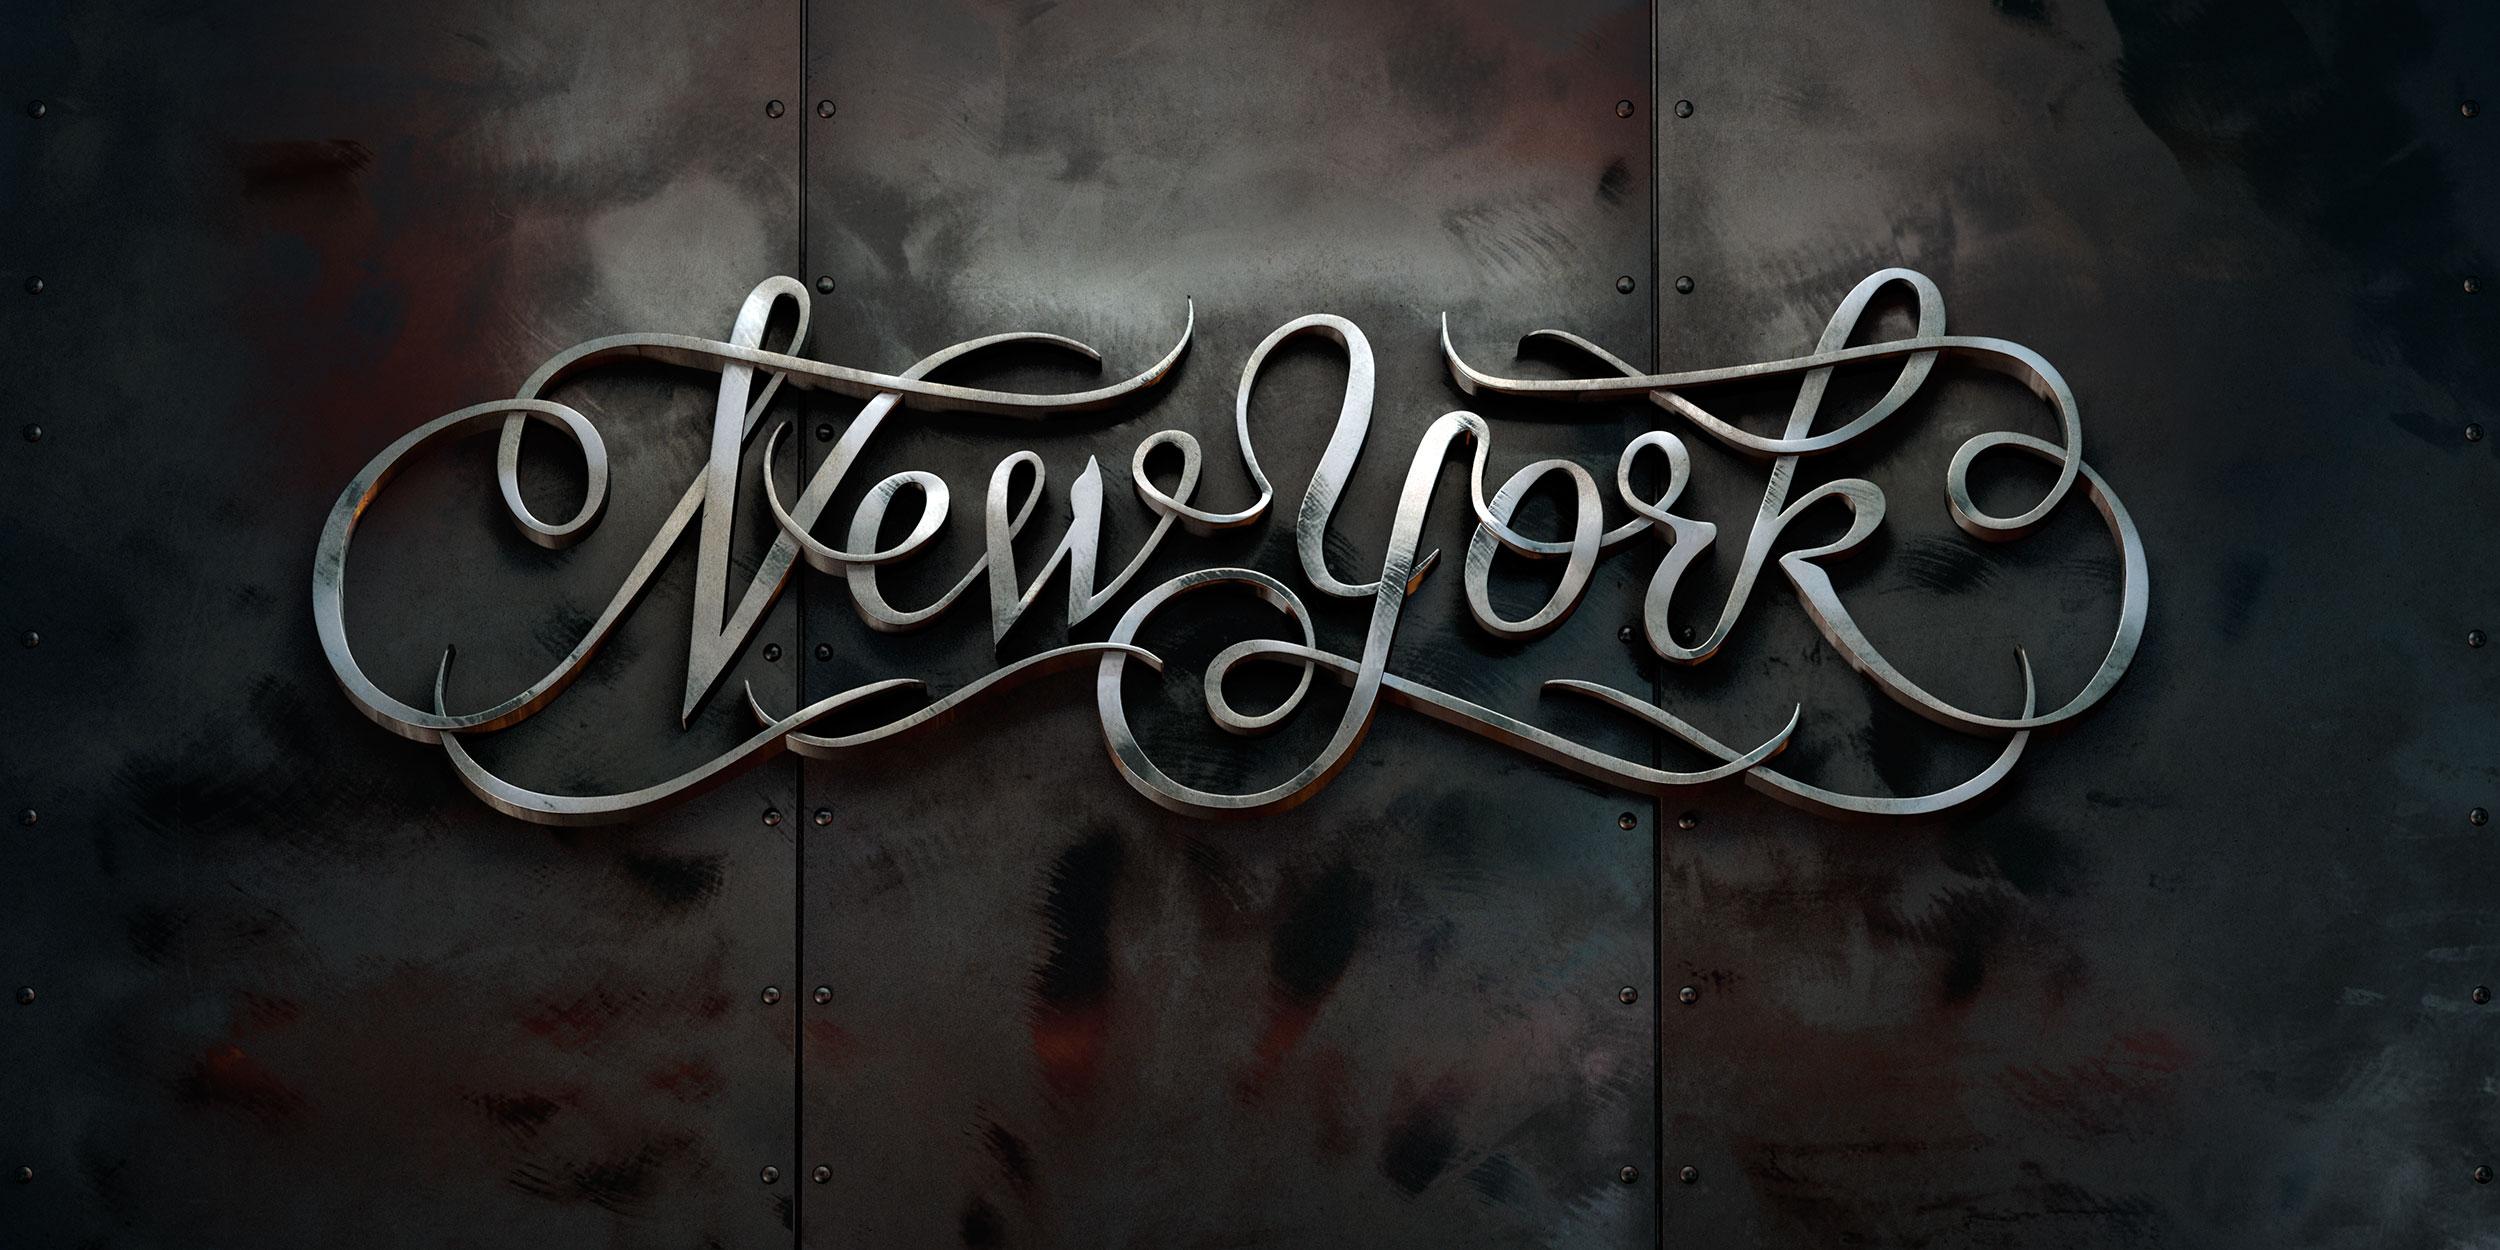 3d-Simon-alander-lettering-by-astorza